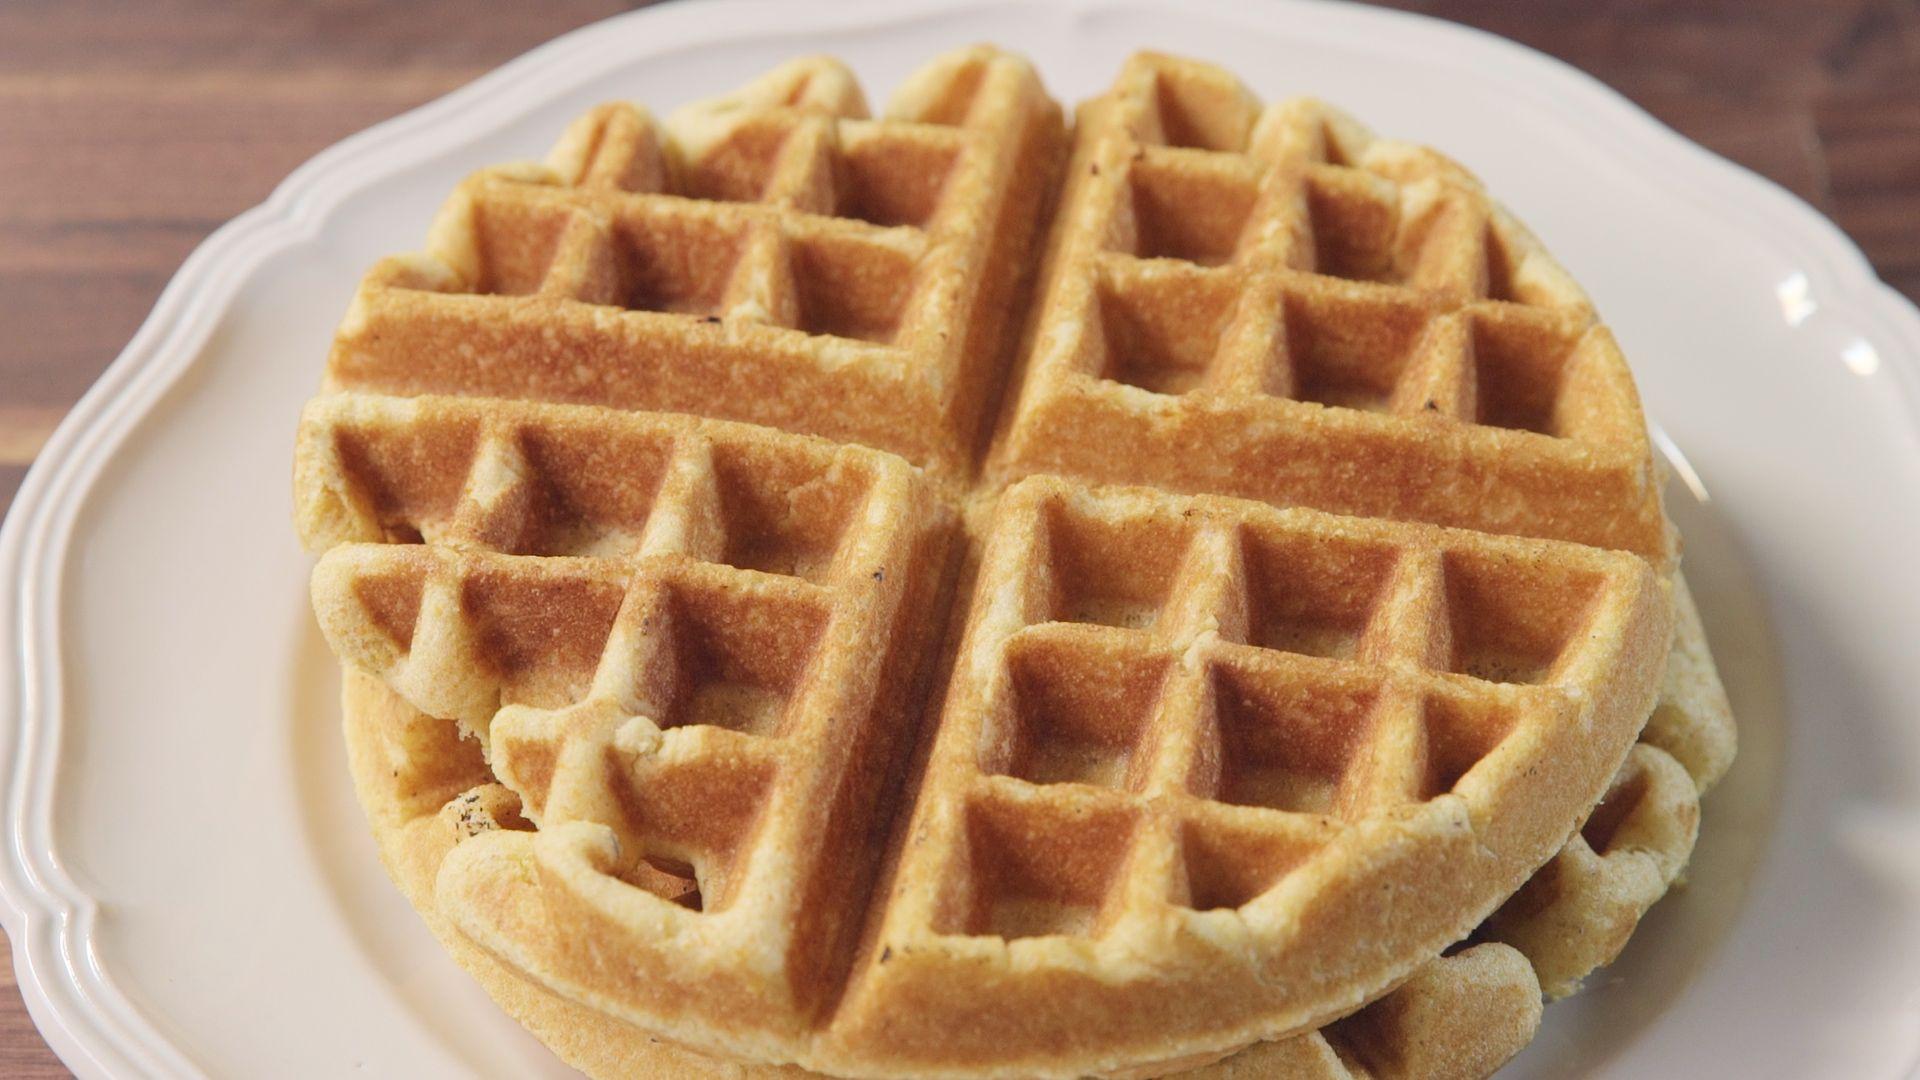 cornbread waffles recipe how to make cornbread waffles from scratch